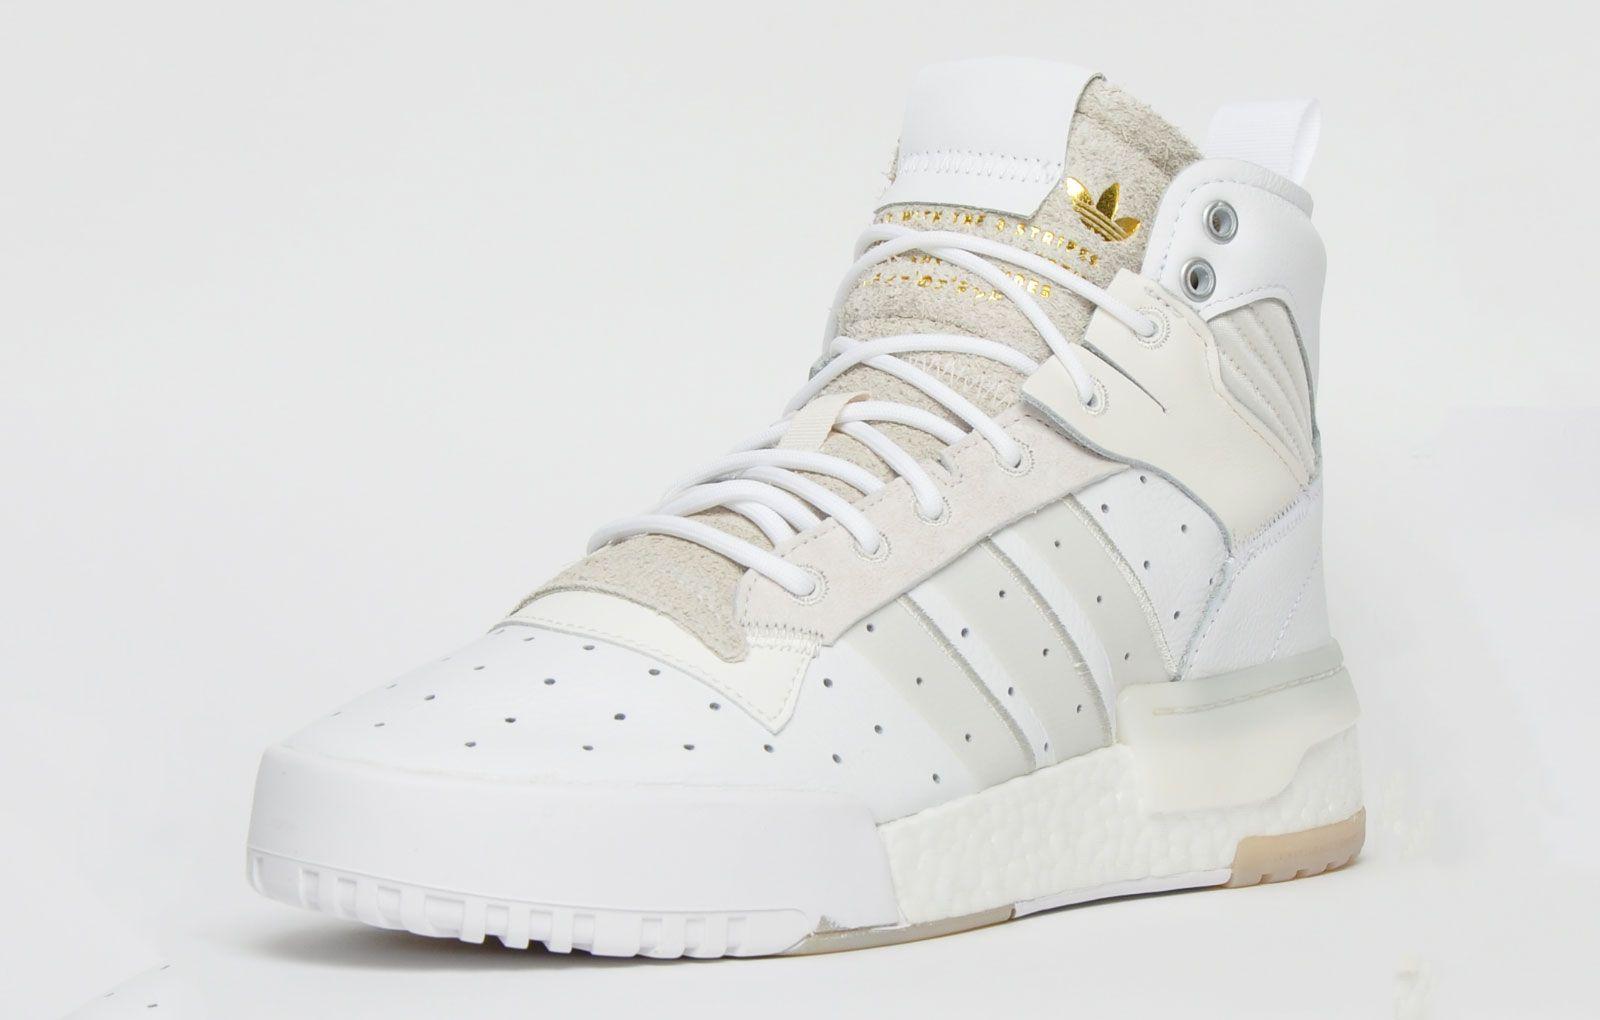 Adidas Originals Rivalry RM Boost Triple White PK Mens